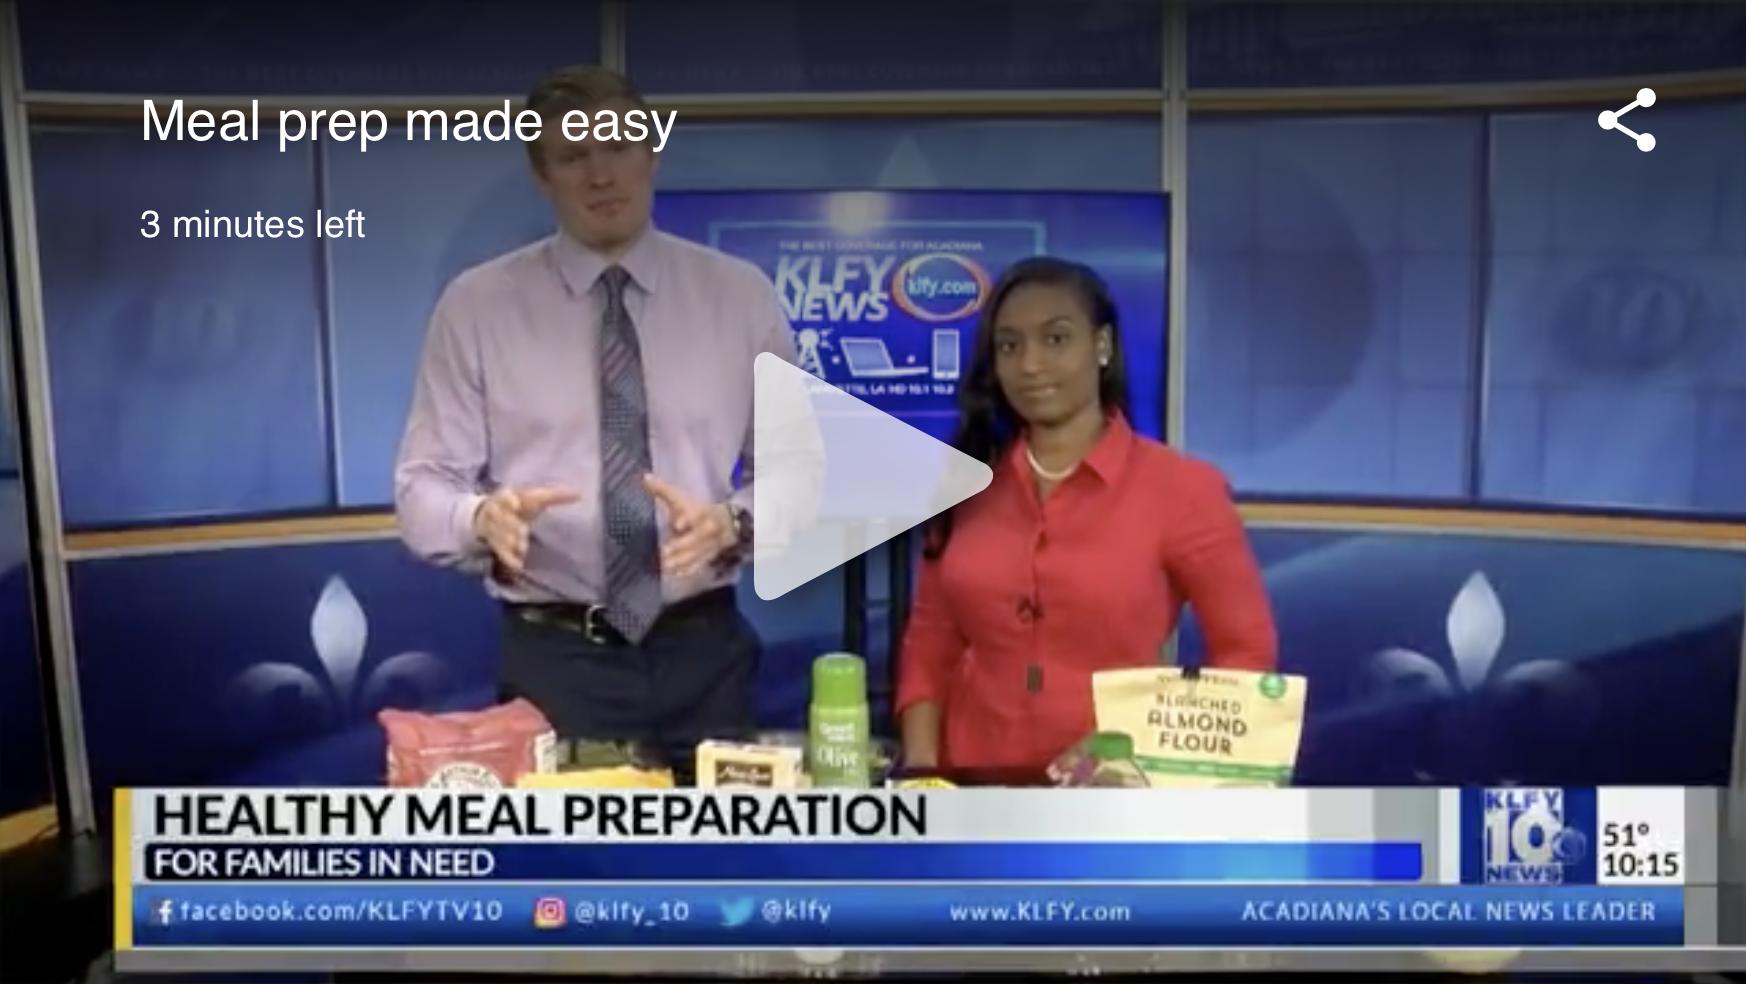 Meal Prep made easy (Nov. 2017)